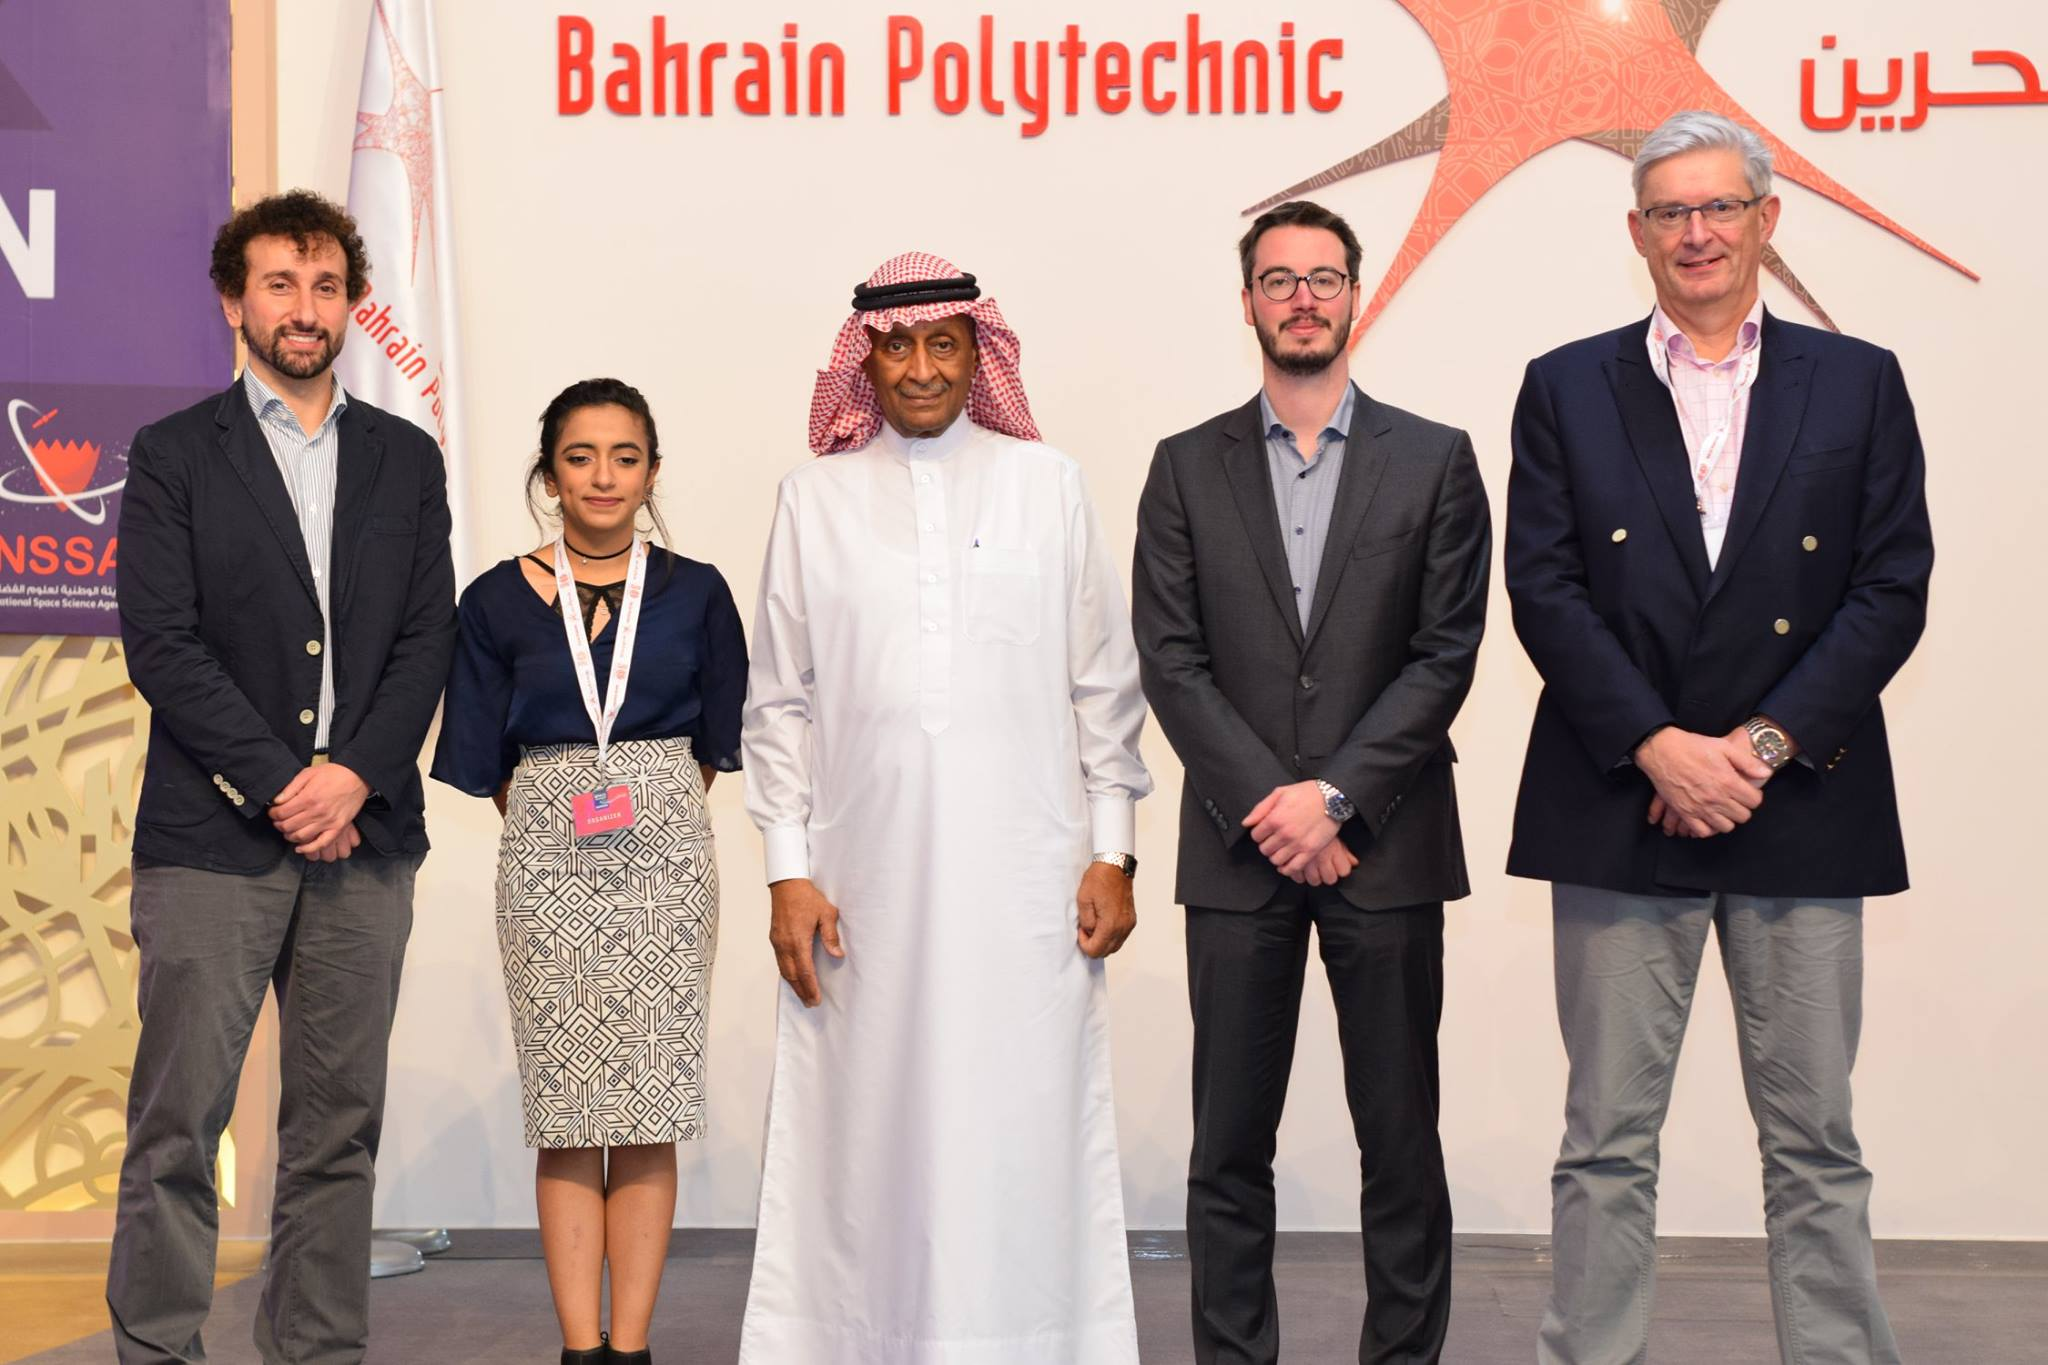 endurosat-at-Space-Technology-for-Bahrain Symposium-2